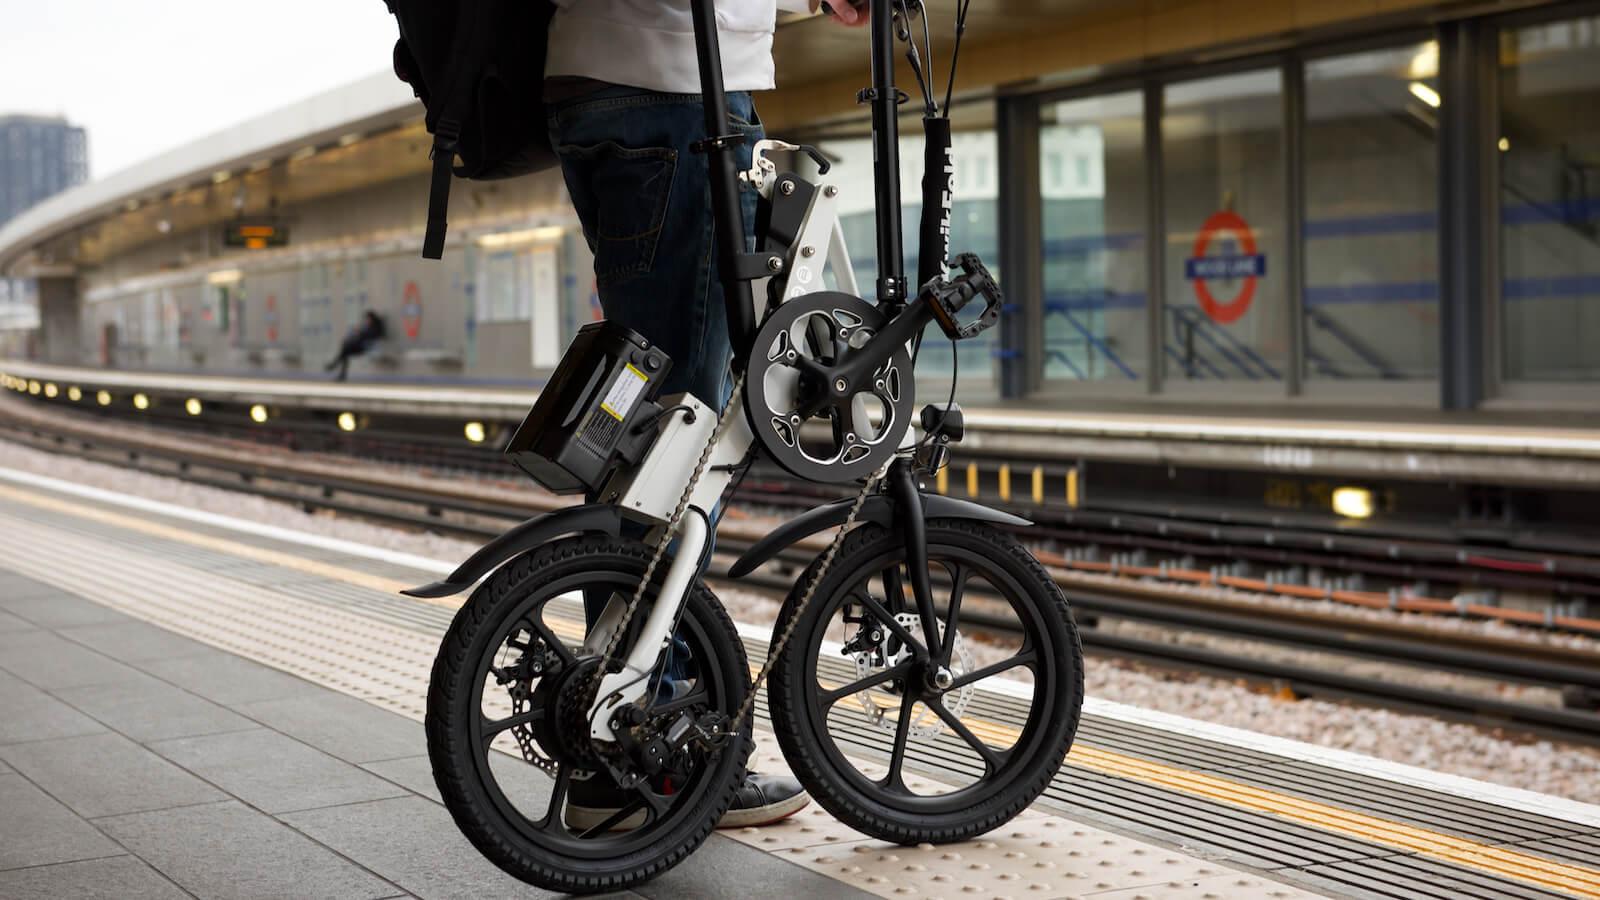 The coolest foldable bikes you can buy KwikFold X-ite 3A electric folding bike